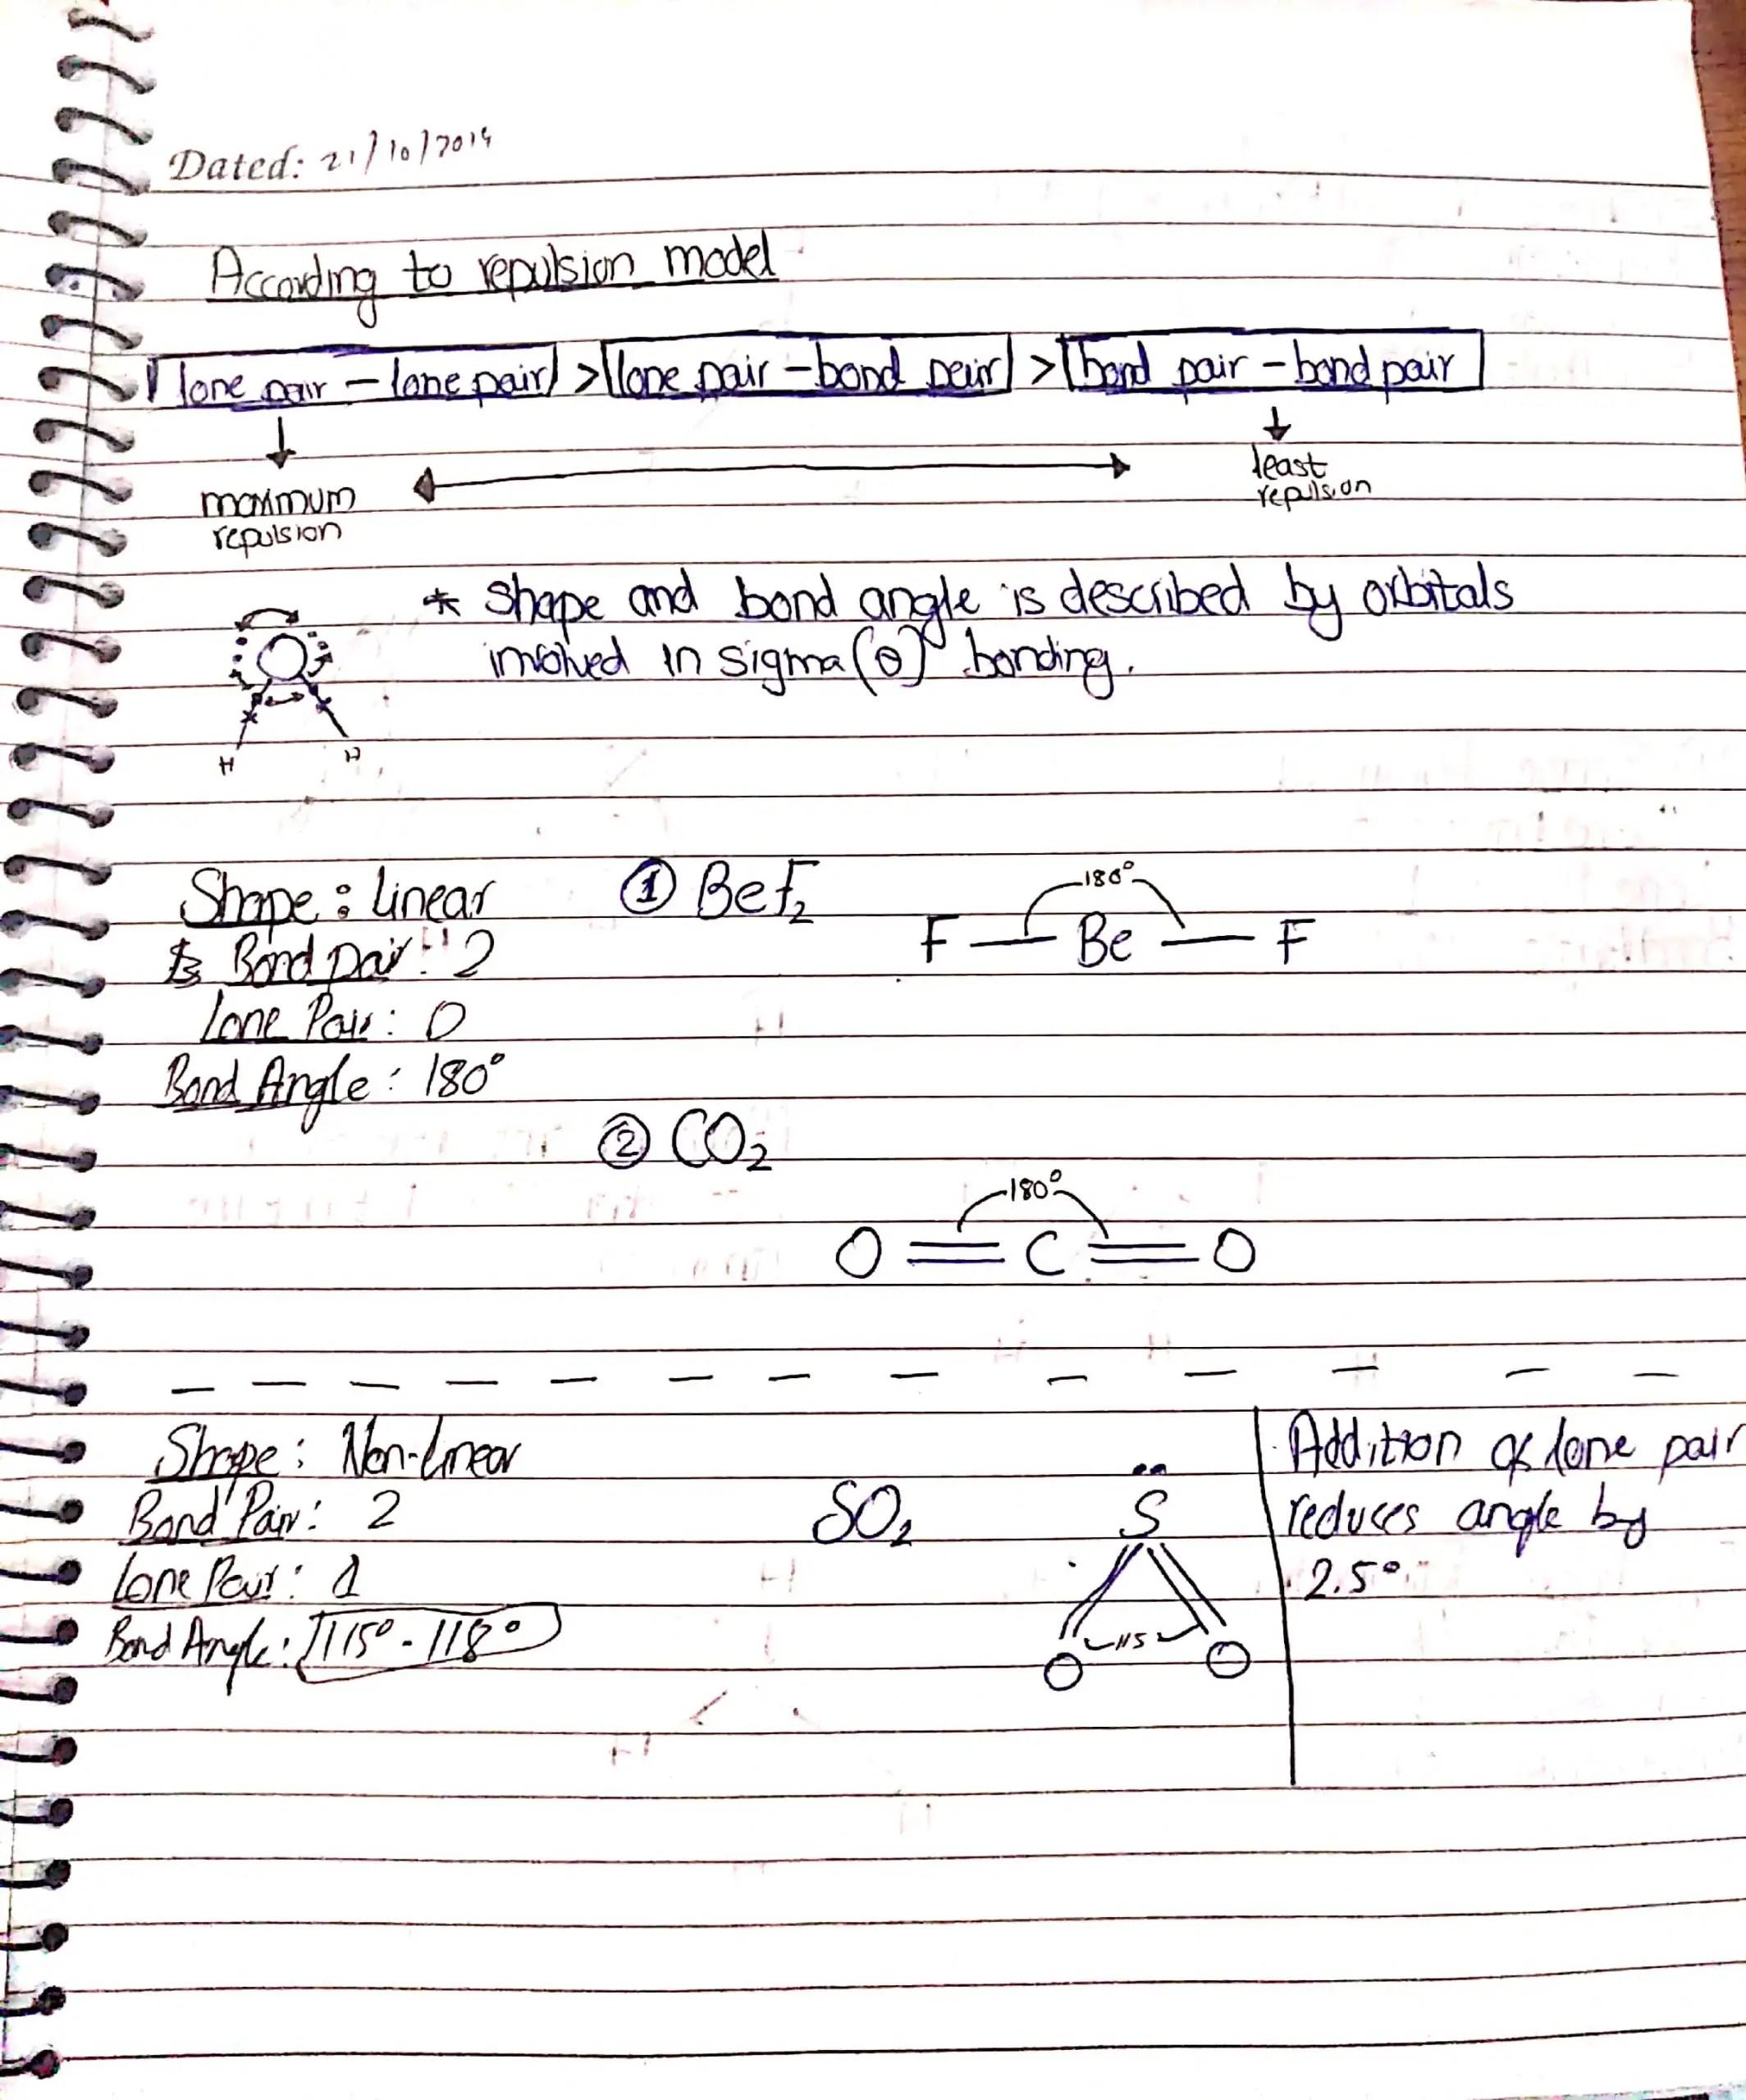 chemical bonding Sir Kashif_26